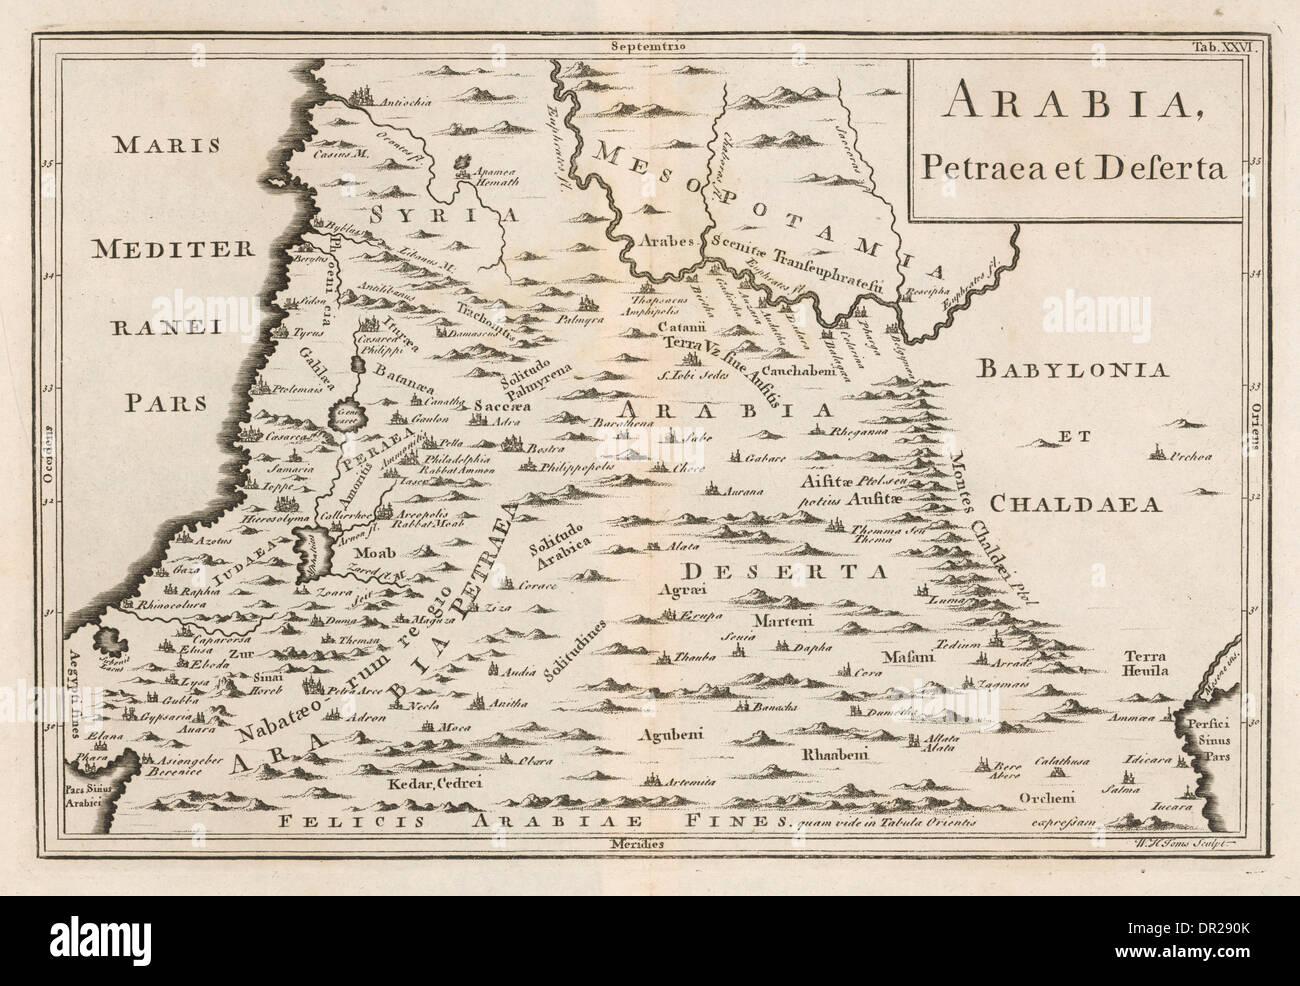 Map Of Arabia Deserta Photo Royalty Free Image 65819171 – Map of Arabia